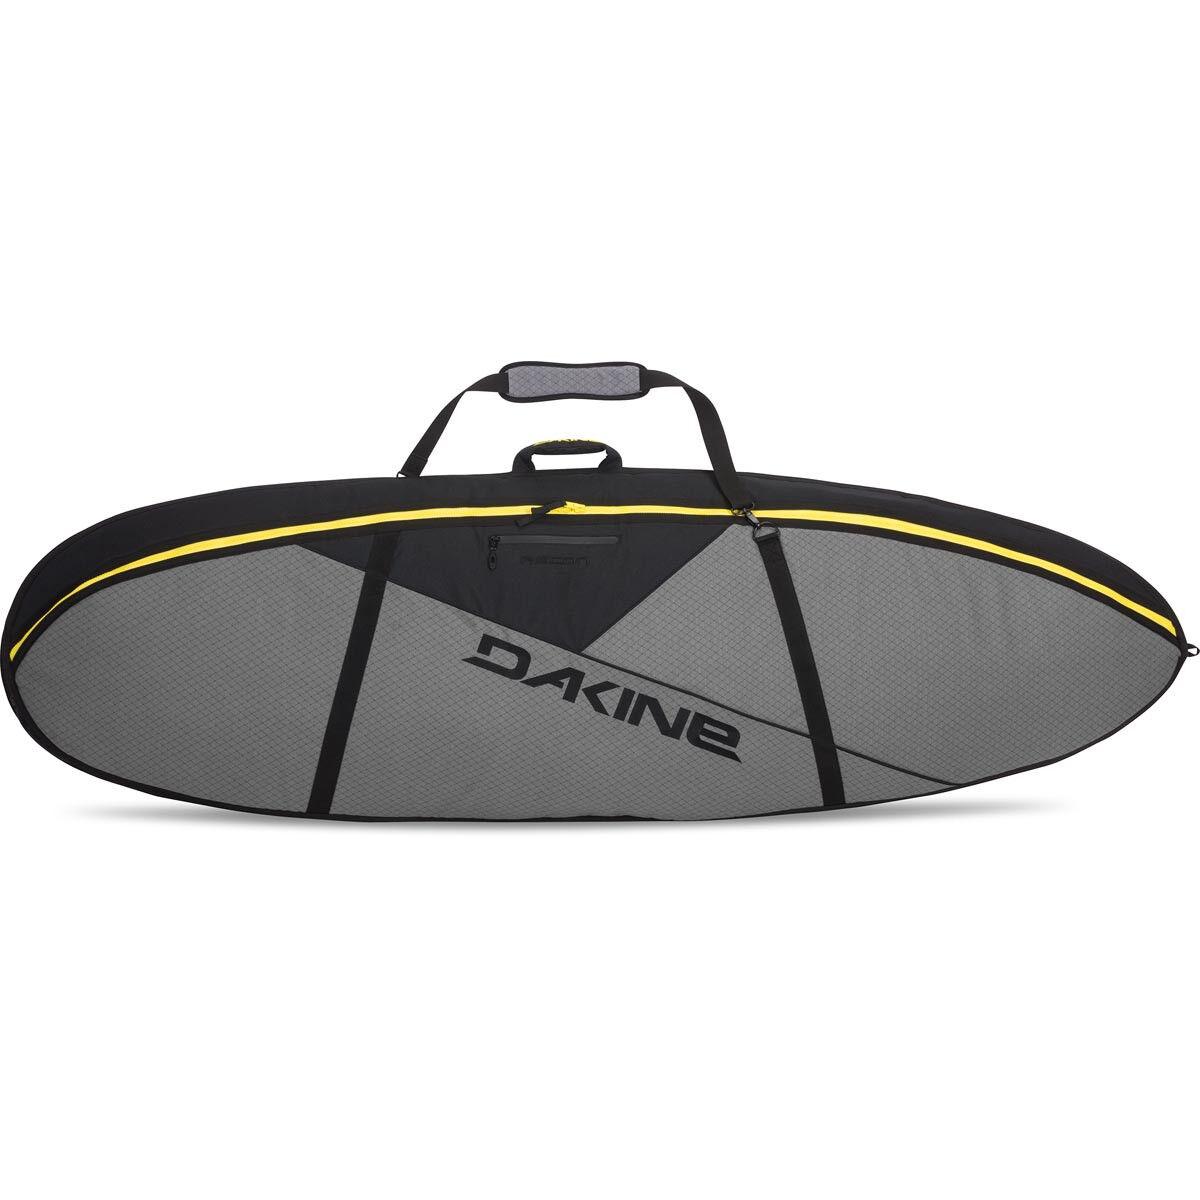 Dakine Recon Double Surfboard Bag Thruster 6'3'' Surf Boardbag Carbon